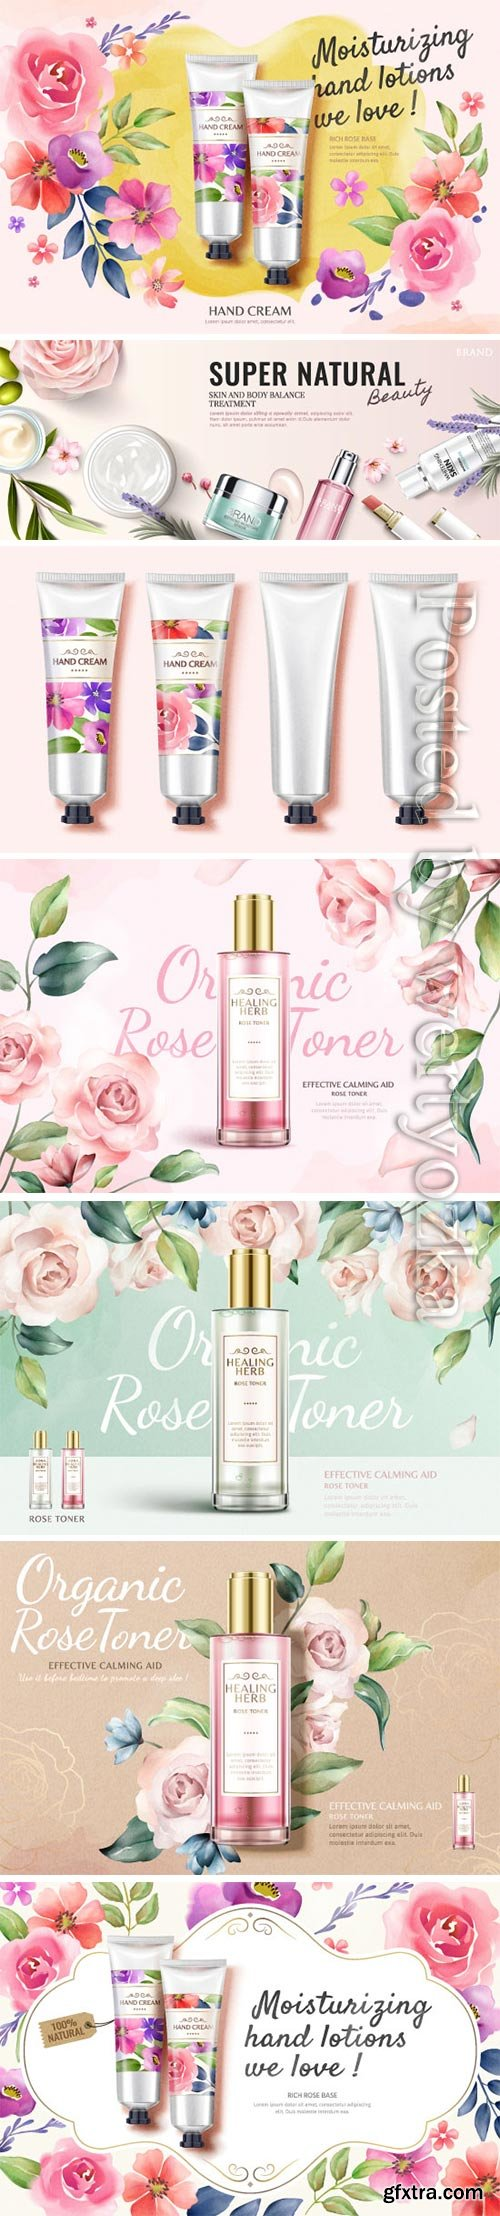 Cosmetics advertising vector posters, perfume, cream, nail polish